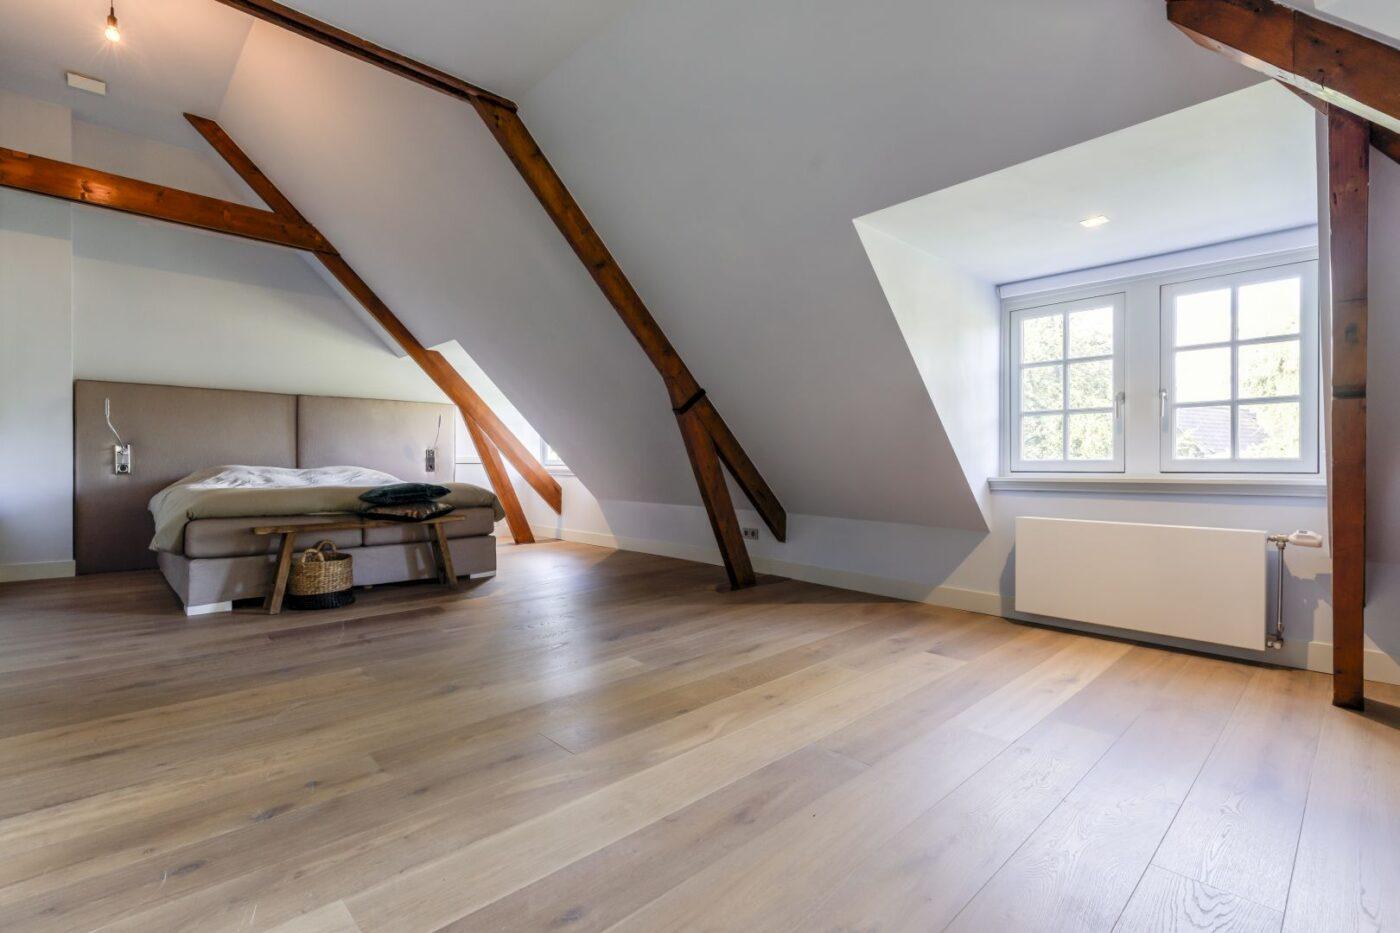 Donkere houten planken vloer in de slaapkamer in Bussum